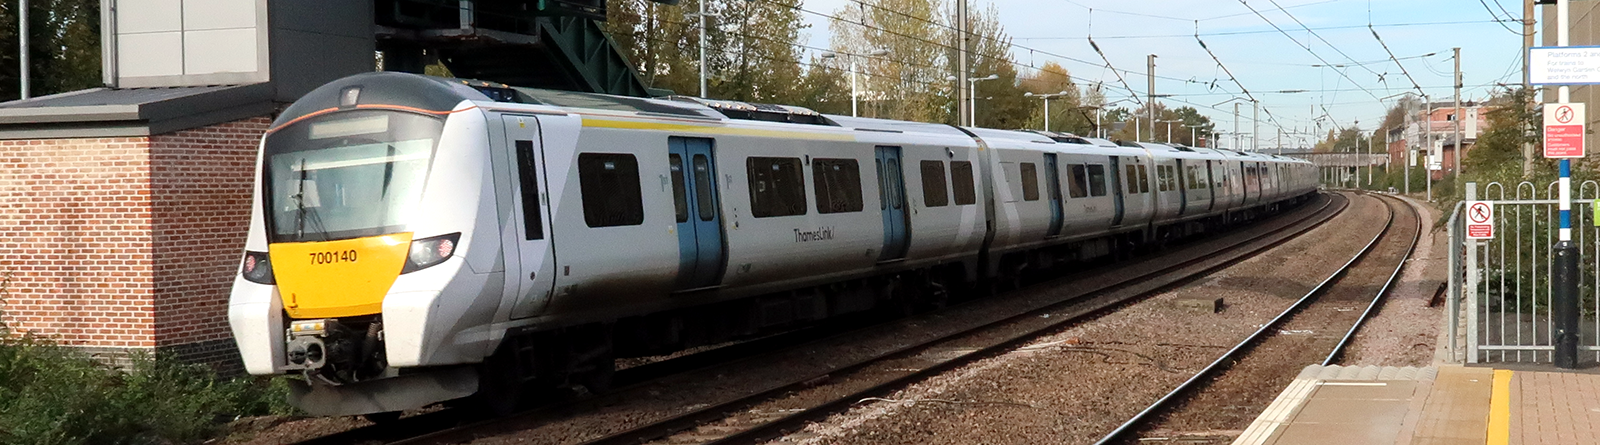 Rail Fares Up; Service Still Down